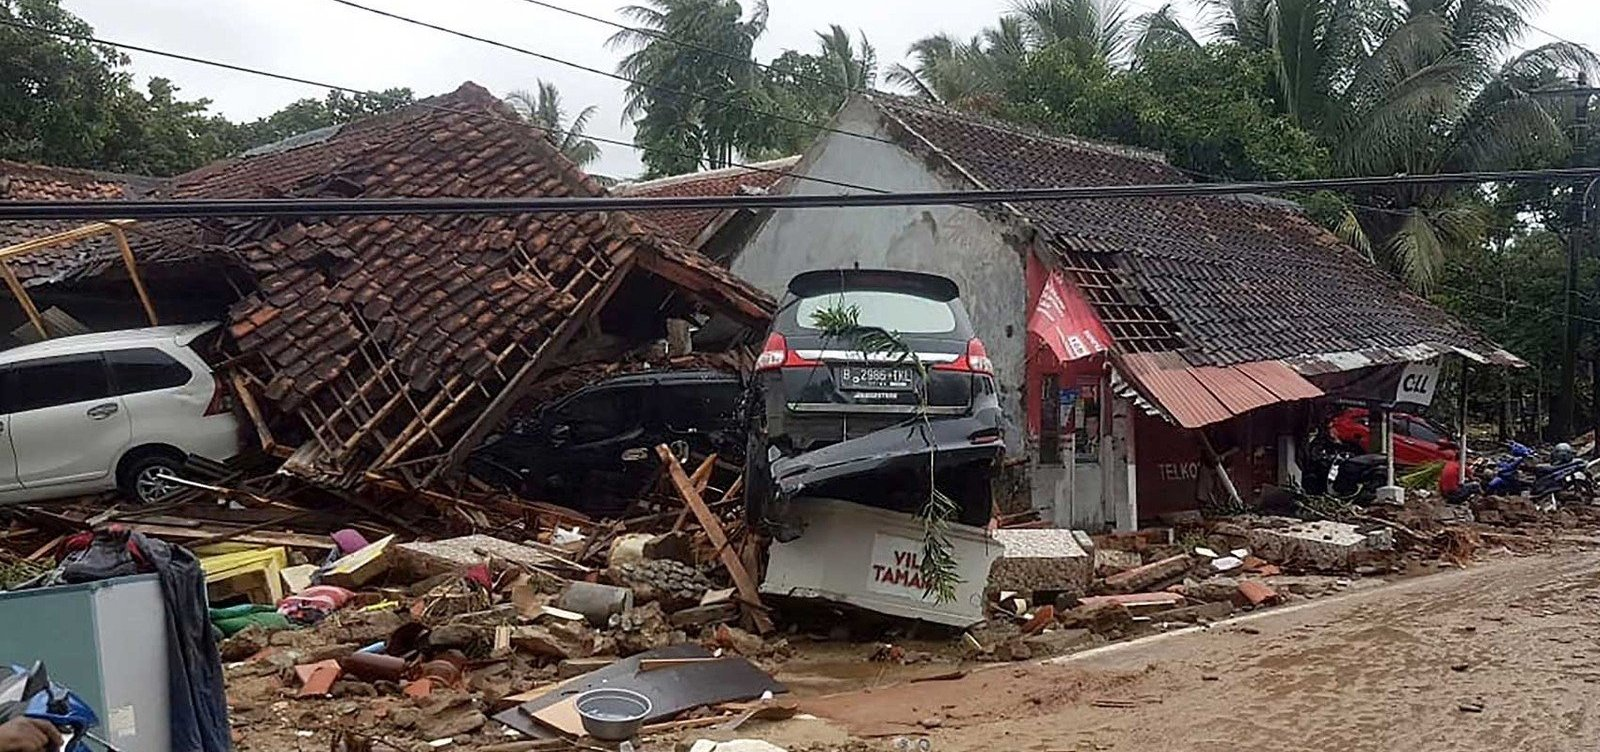 [Tsunami na Indonésia provoca 160 mortes e deixa 700 feridos]